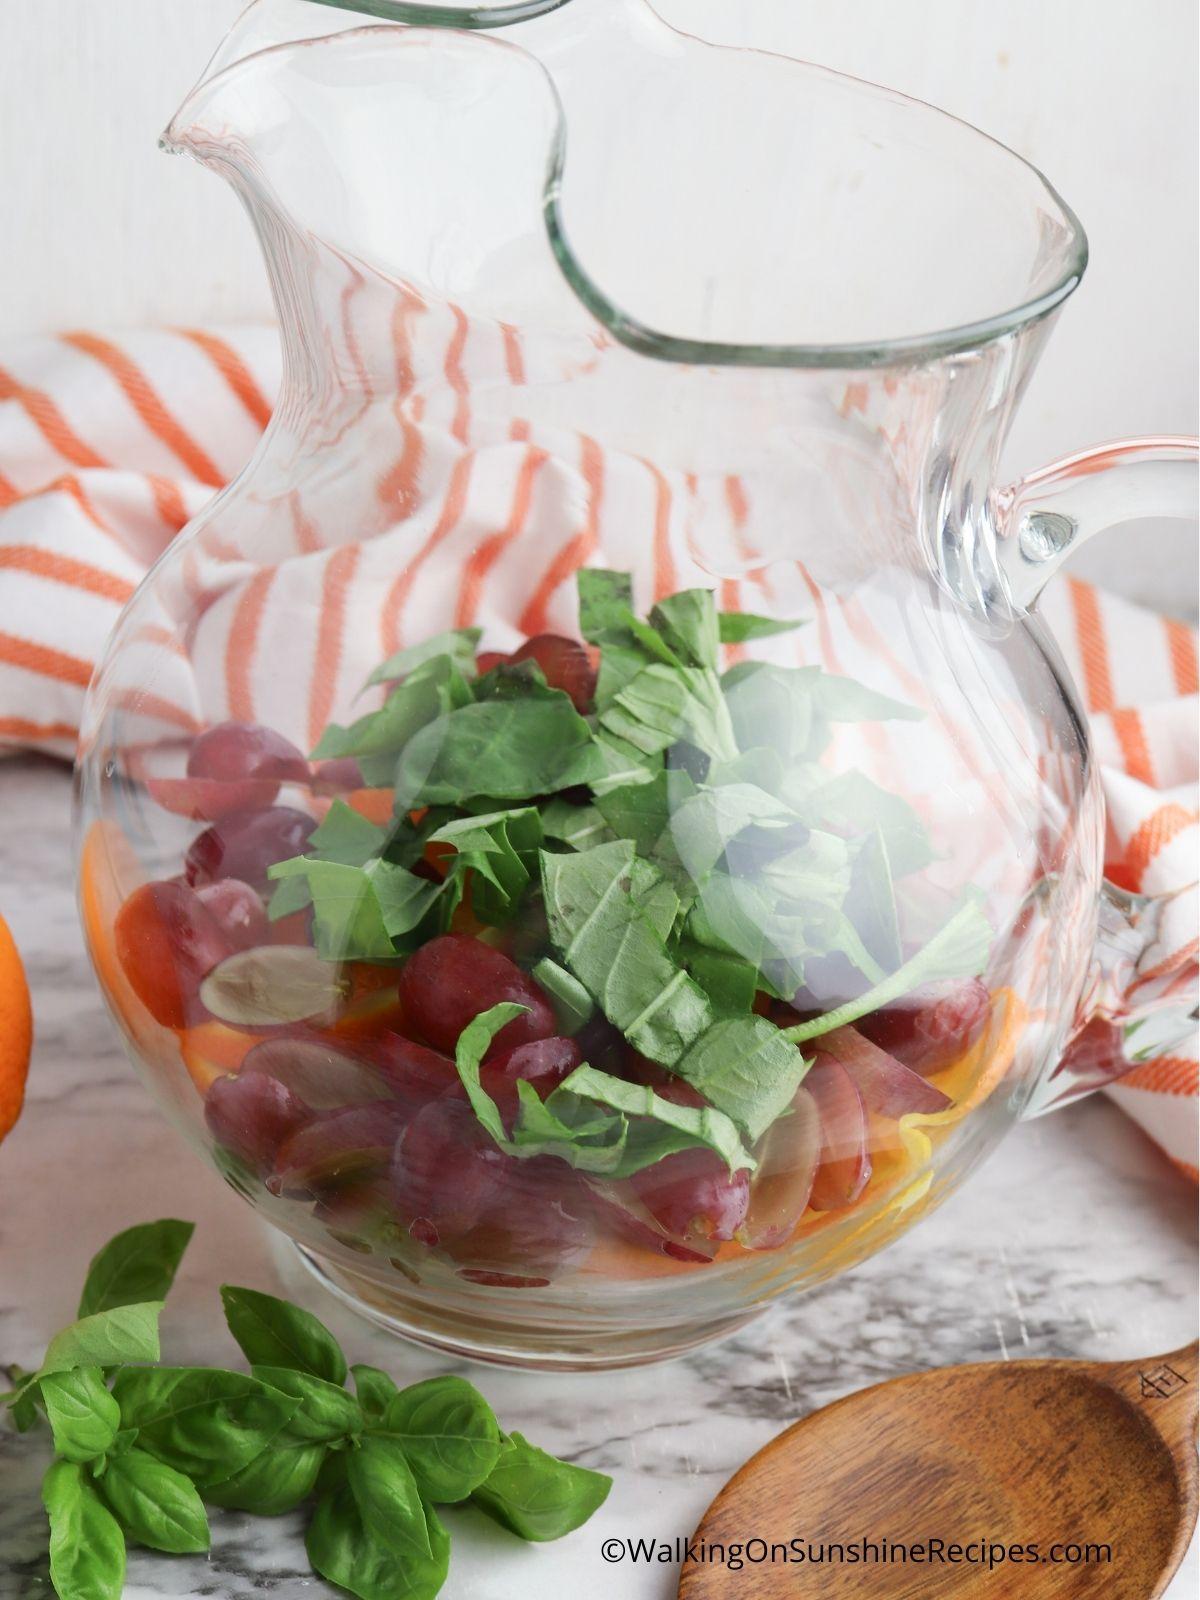 Add fruit, basil to pitcher.